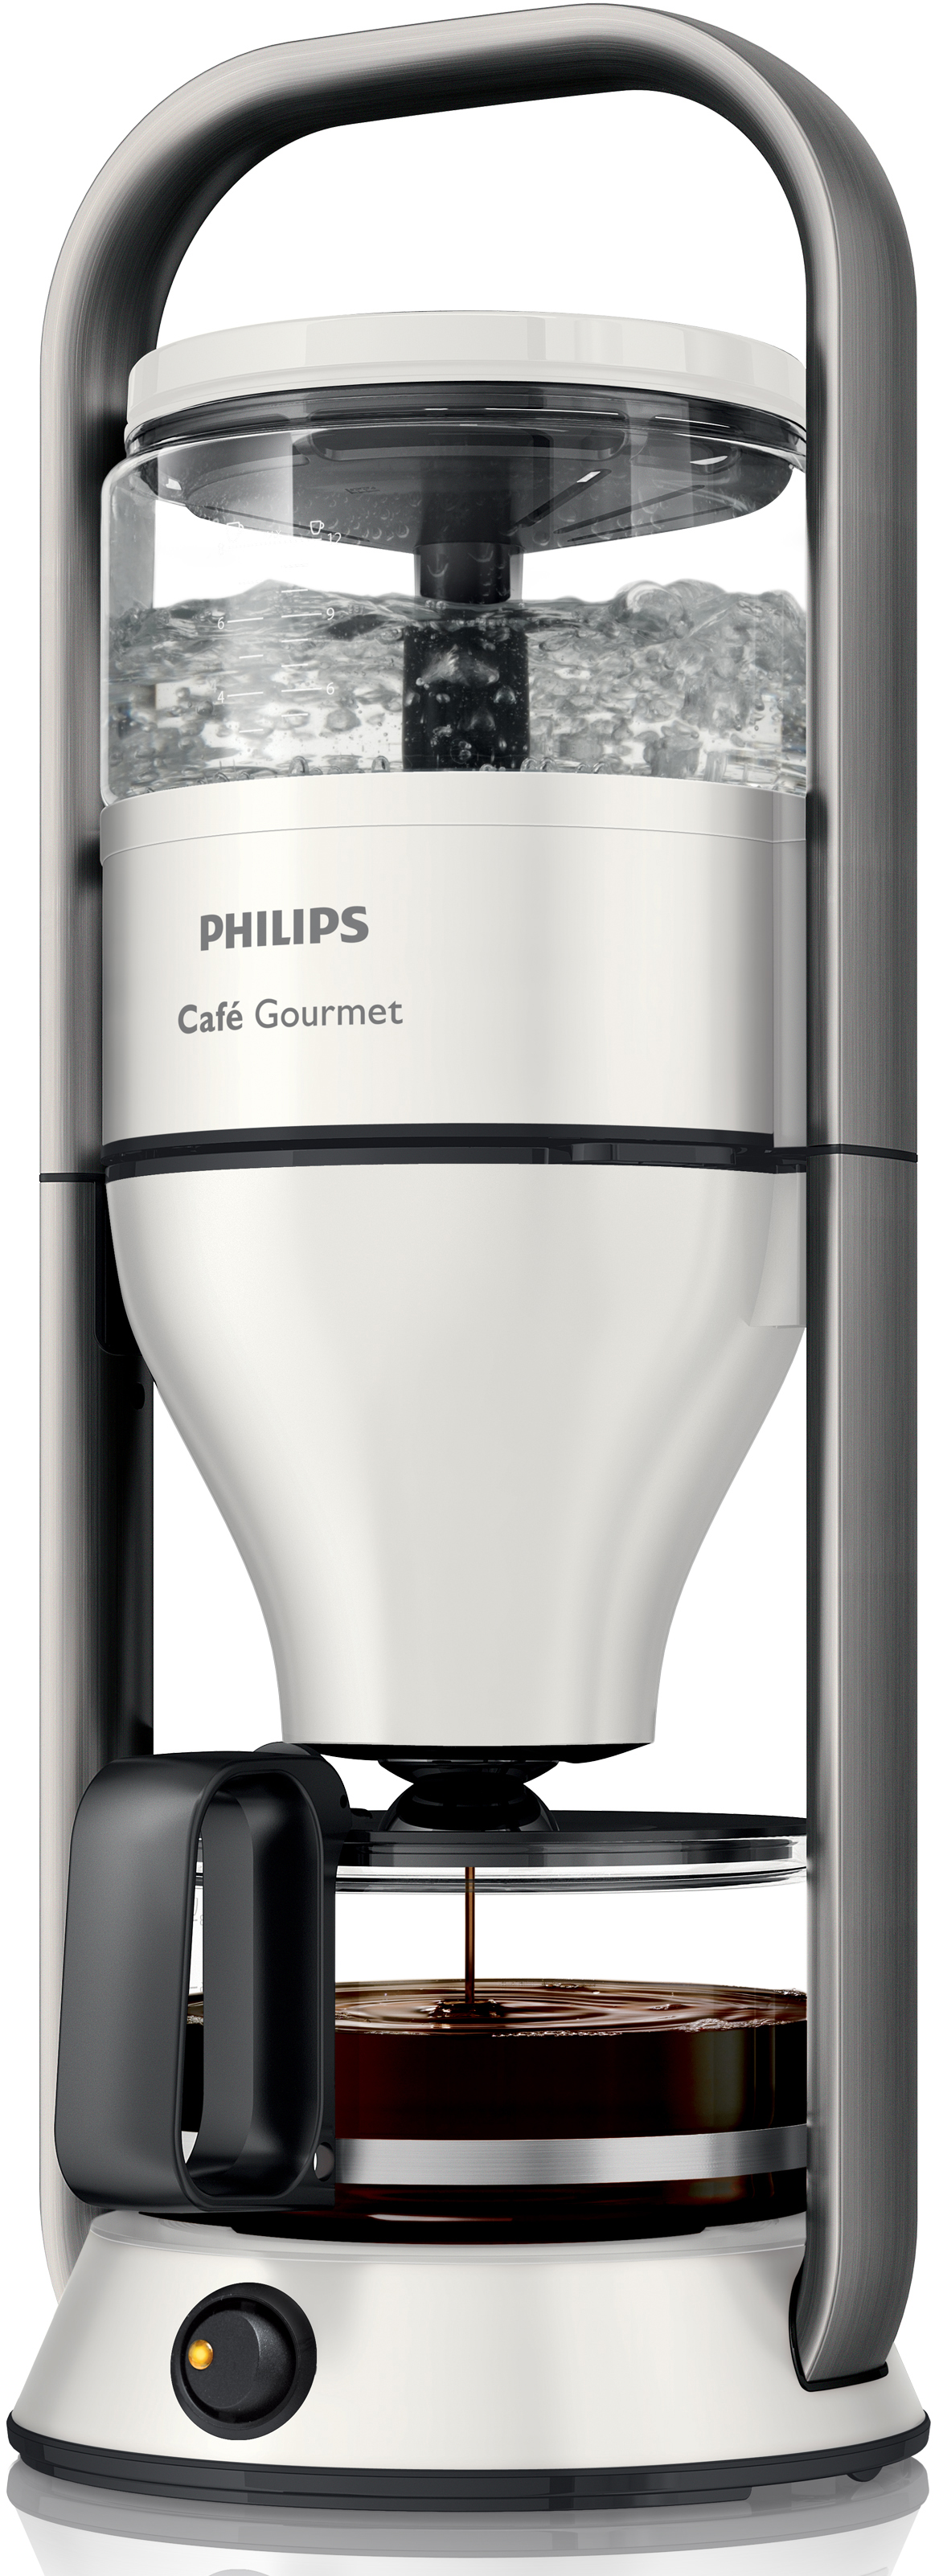 philips kaffeemaschine café gourmet hd540710  ~ Kaffeemaschine Philips